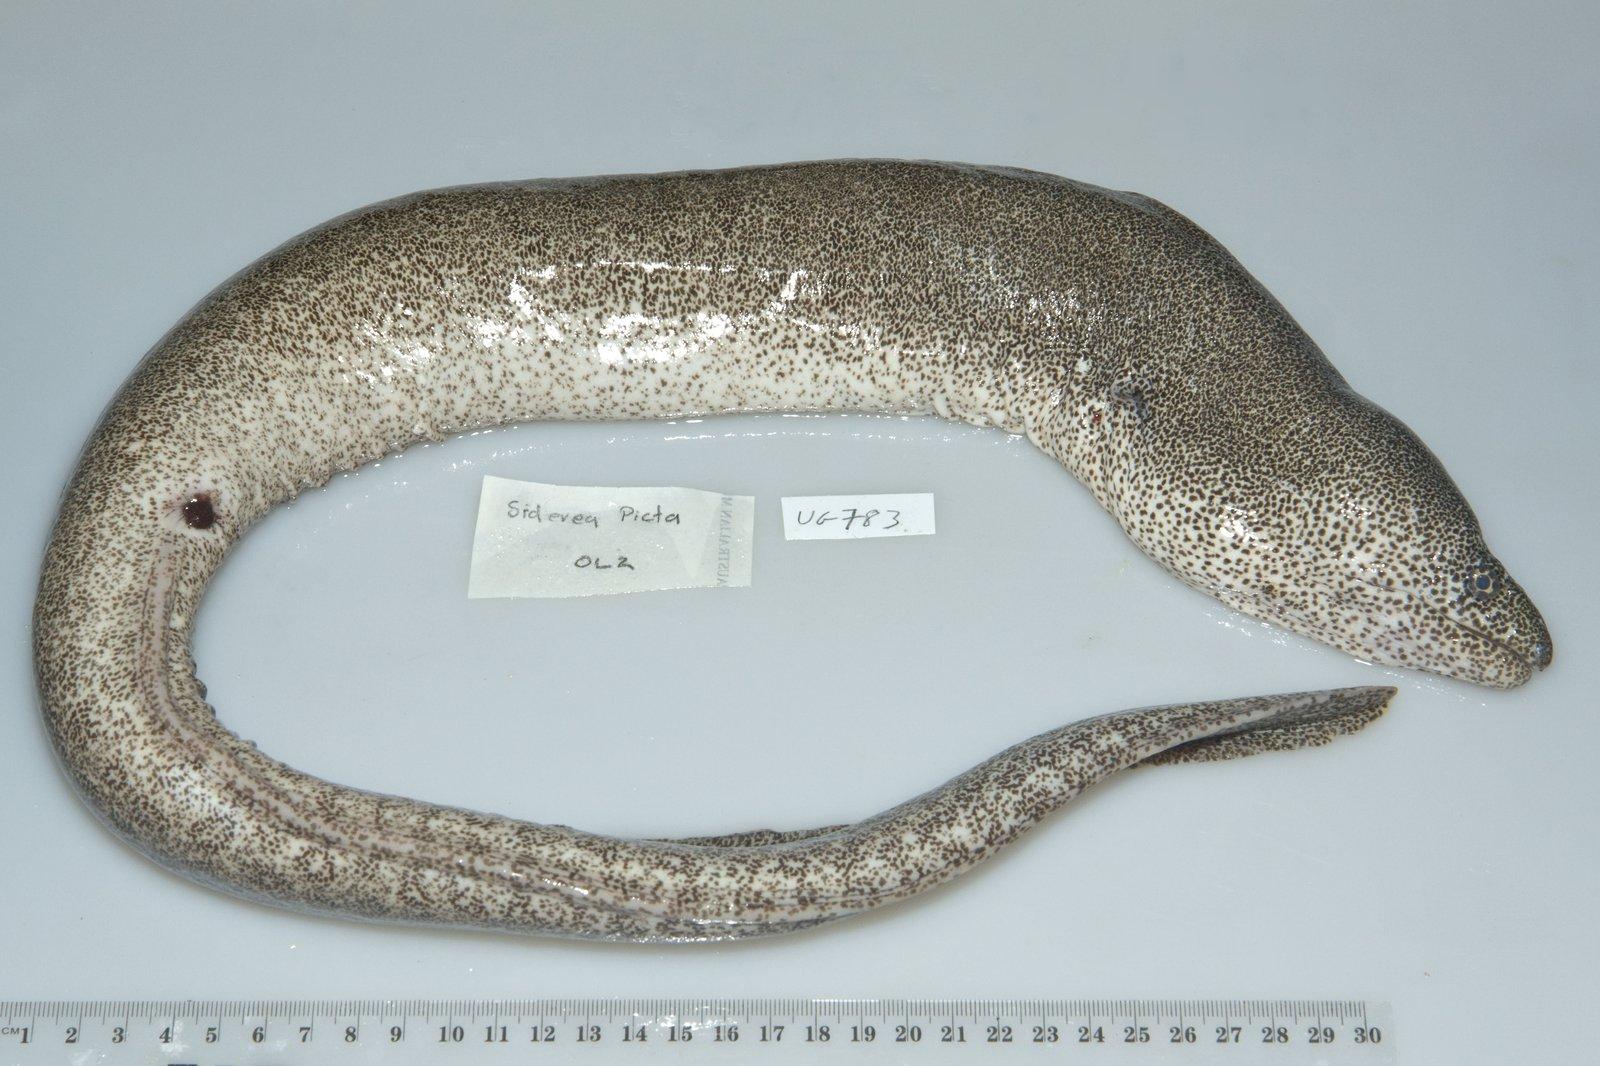 I.44742-012 - Gymnothorax pictus